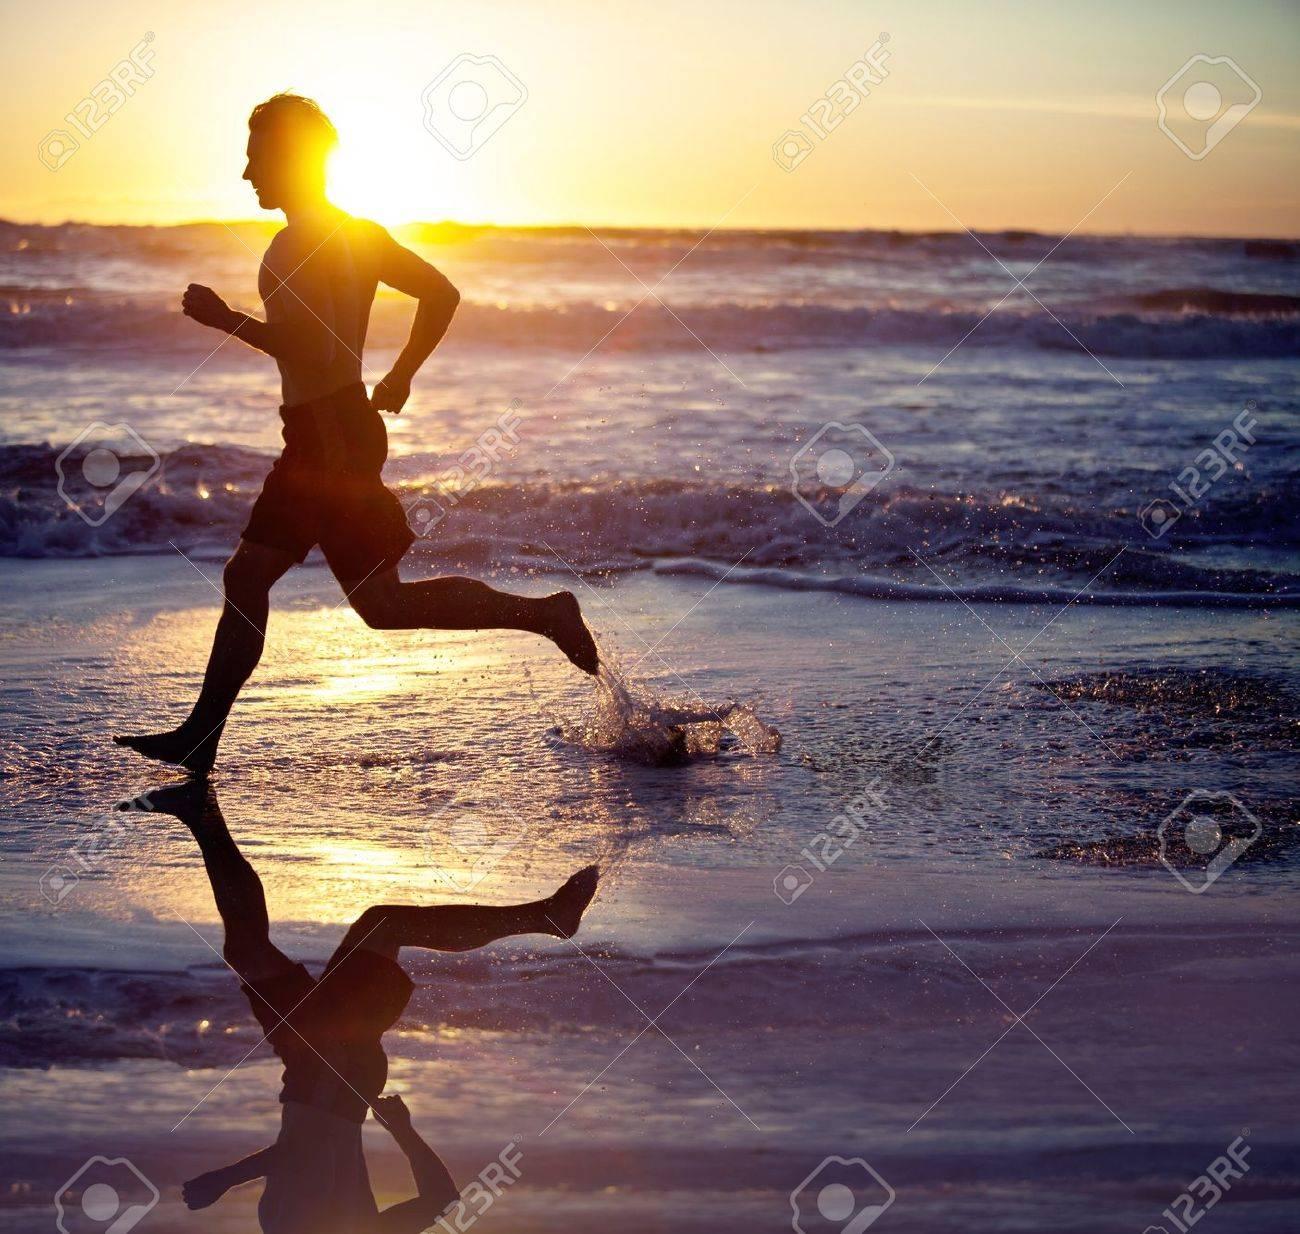 Man running on the beach at sunset - 18304534